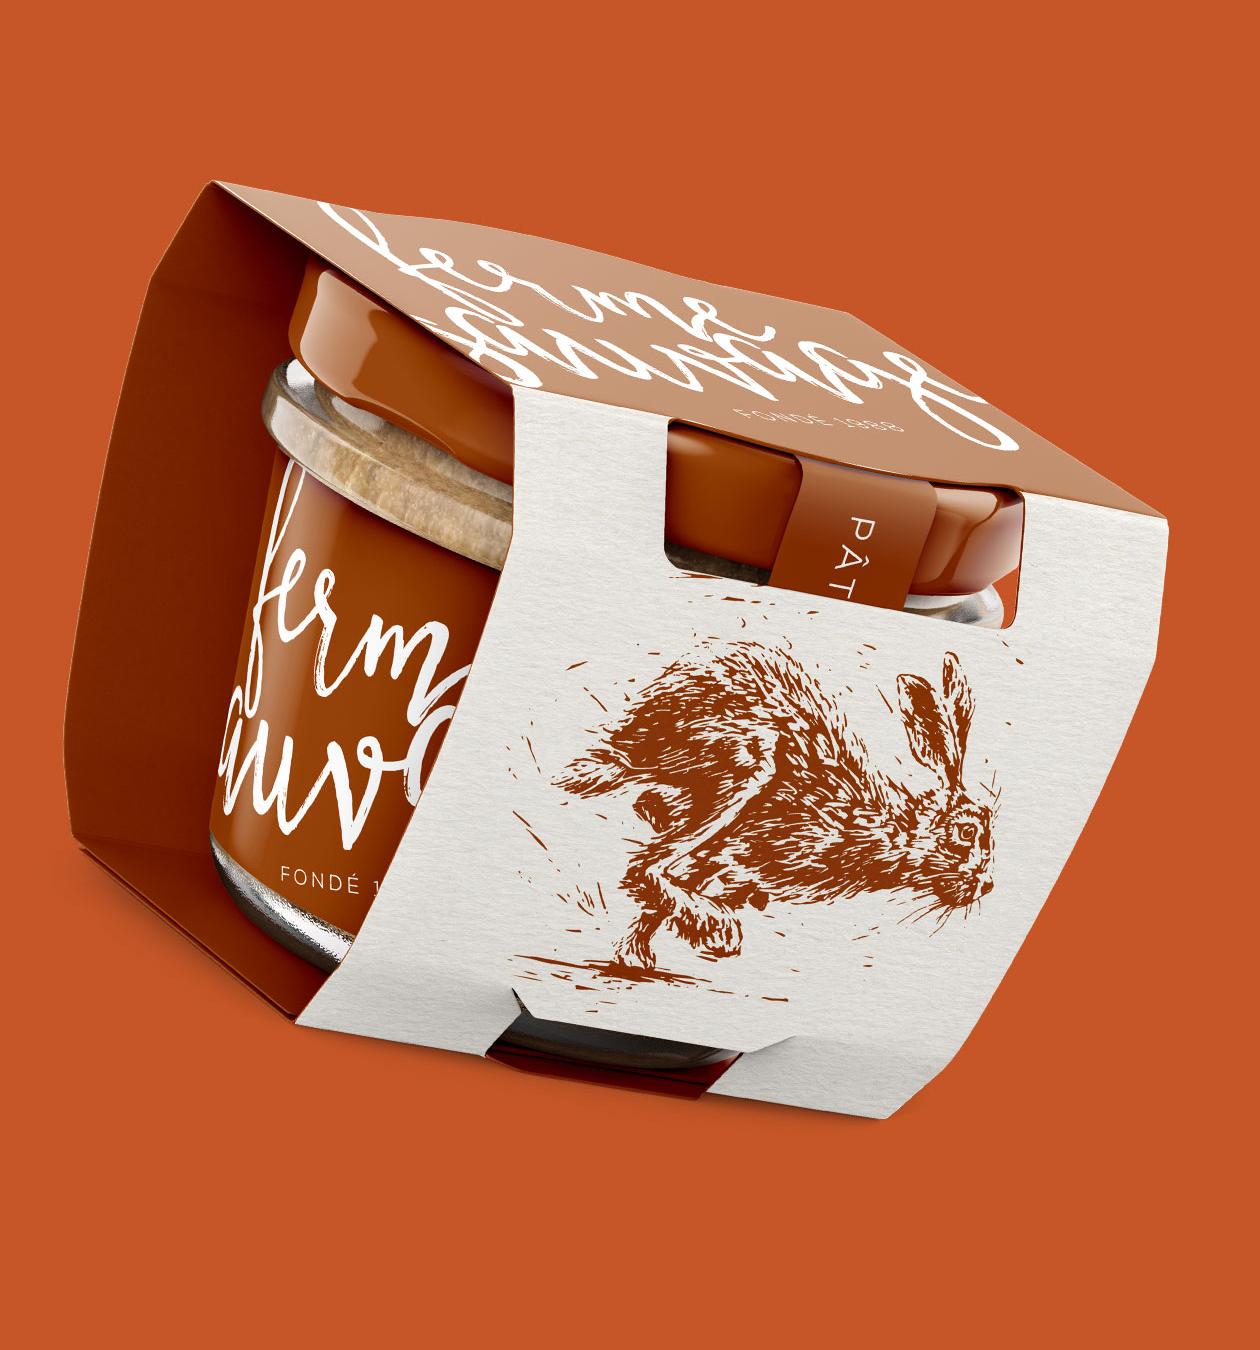 D_ferme-sauvage-packaging-pate-maison_1.jpg